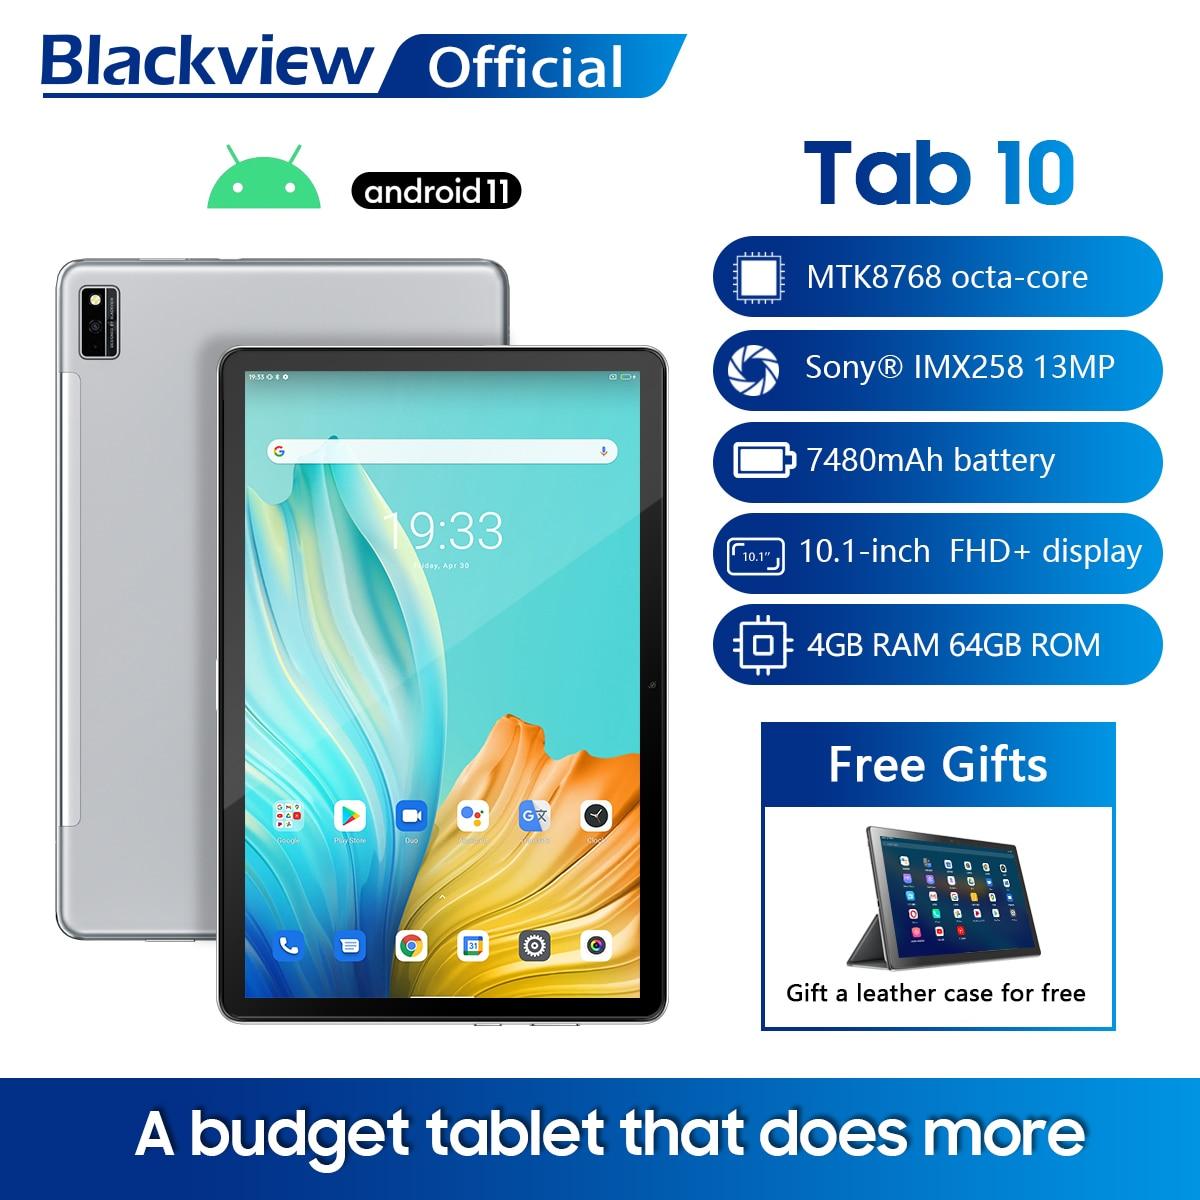 "Blackview TAB 10 Android 11 Tablet 10.1"" MTK8768 Octa Core 1920x1200 4GB RAM 64GB ROM 4G Network 7480mAh Tablets PC Dual Wifi"